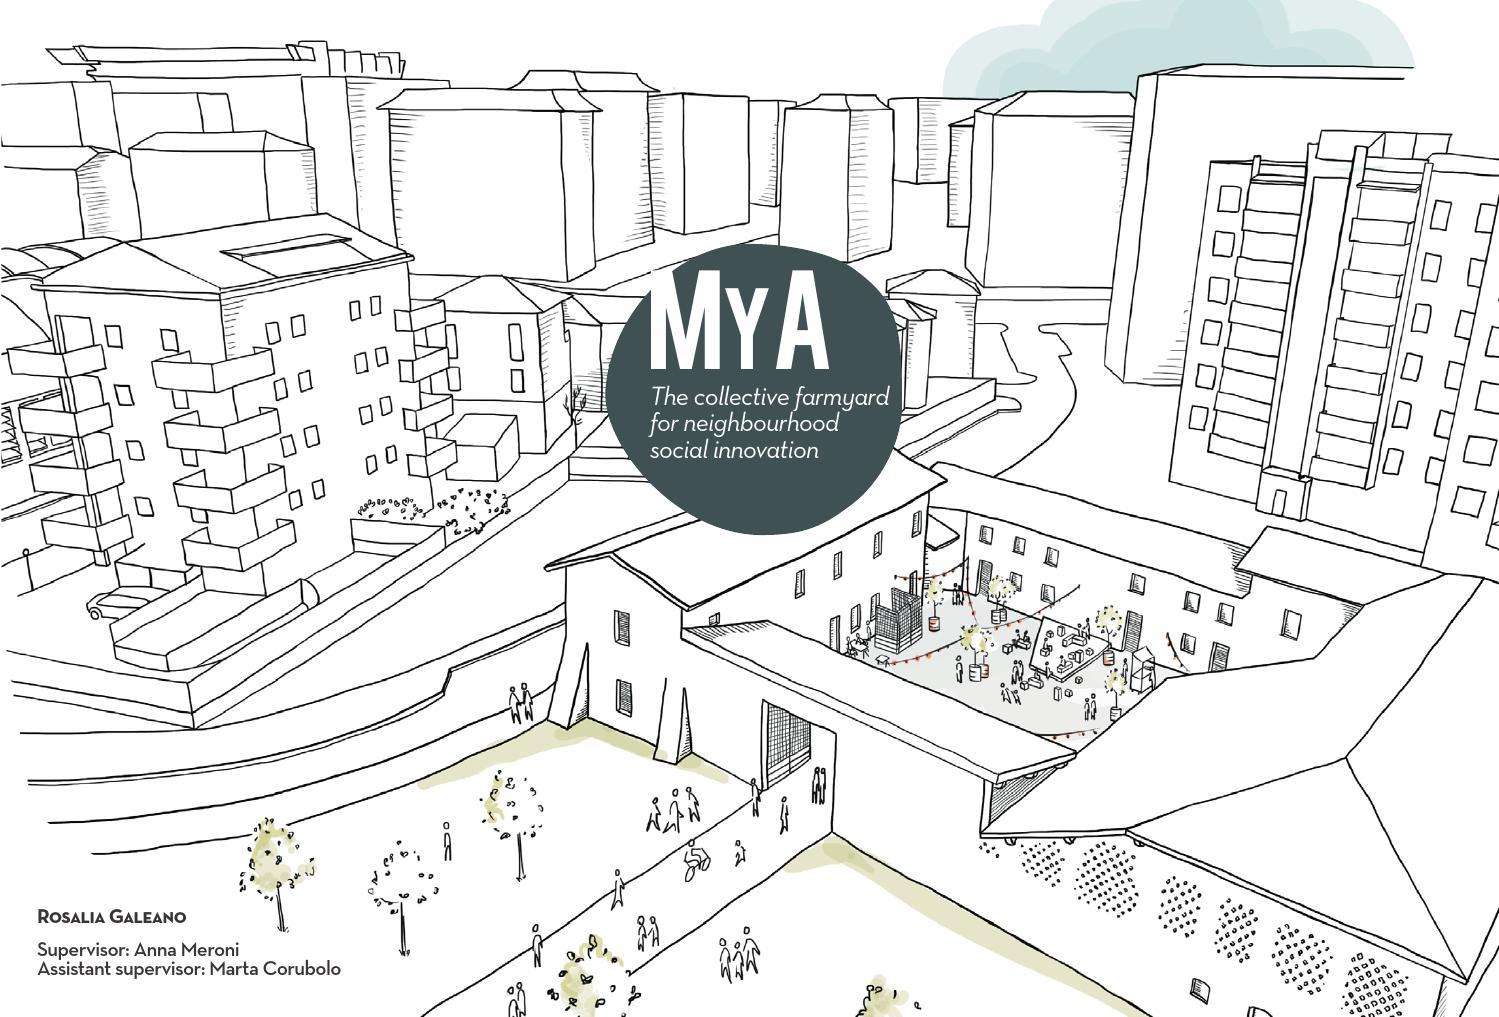 Schema Elettrico City 250 : Mya service design thesis by rosalia galeano issuu